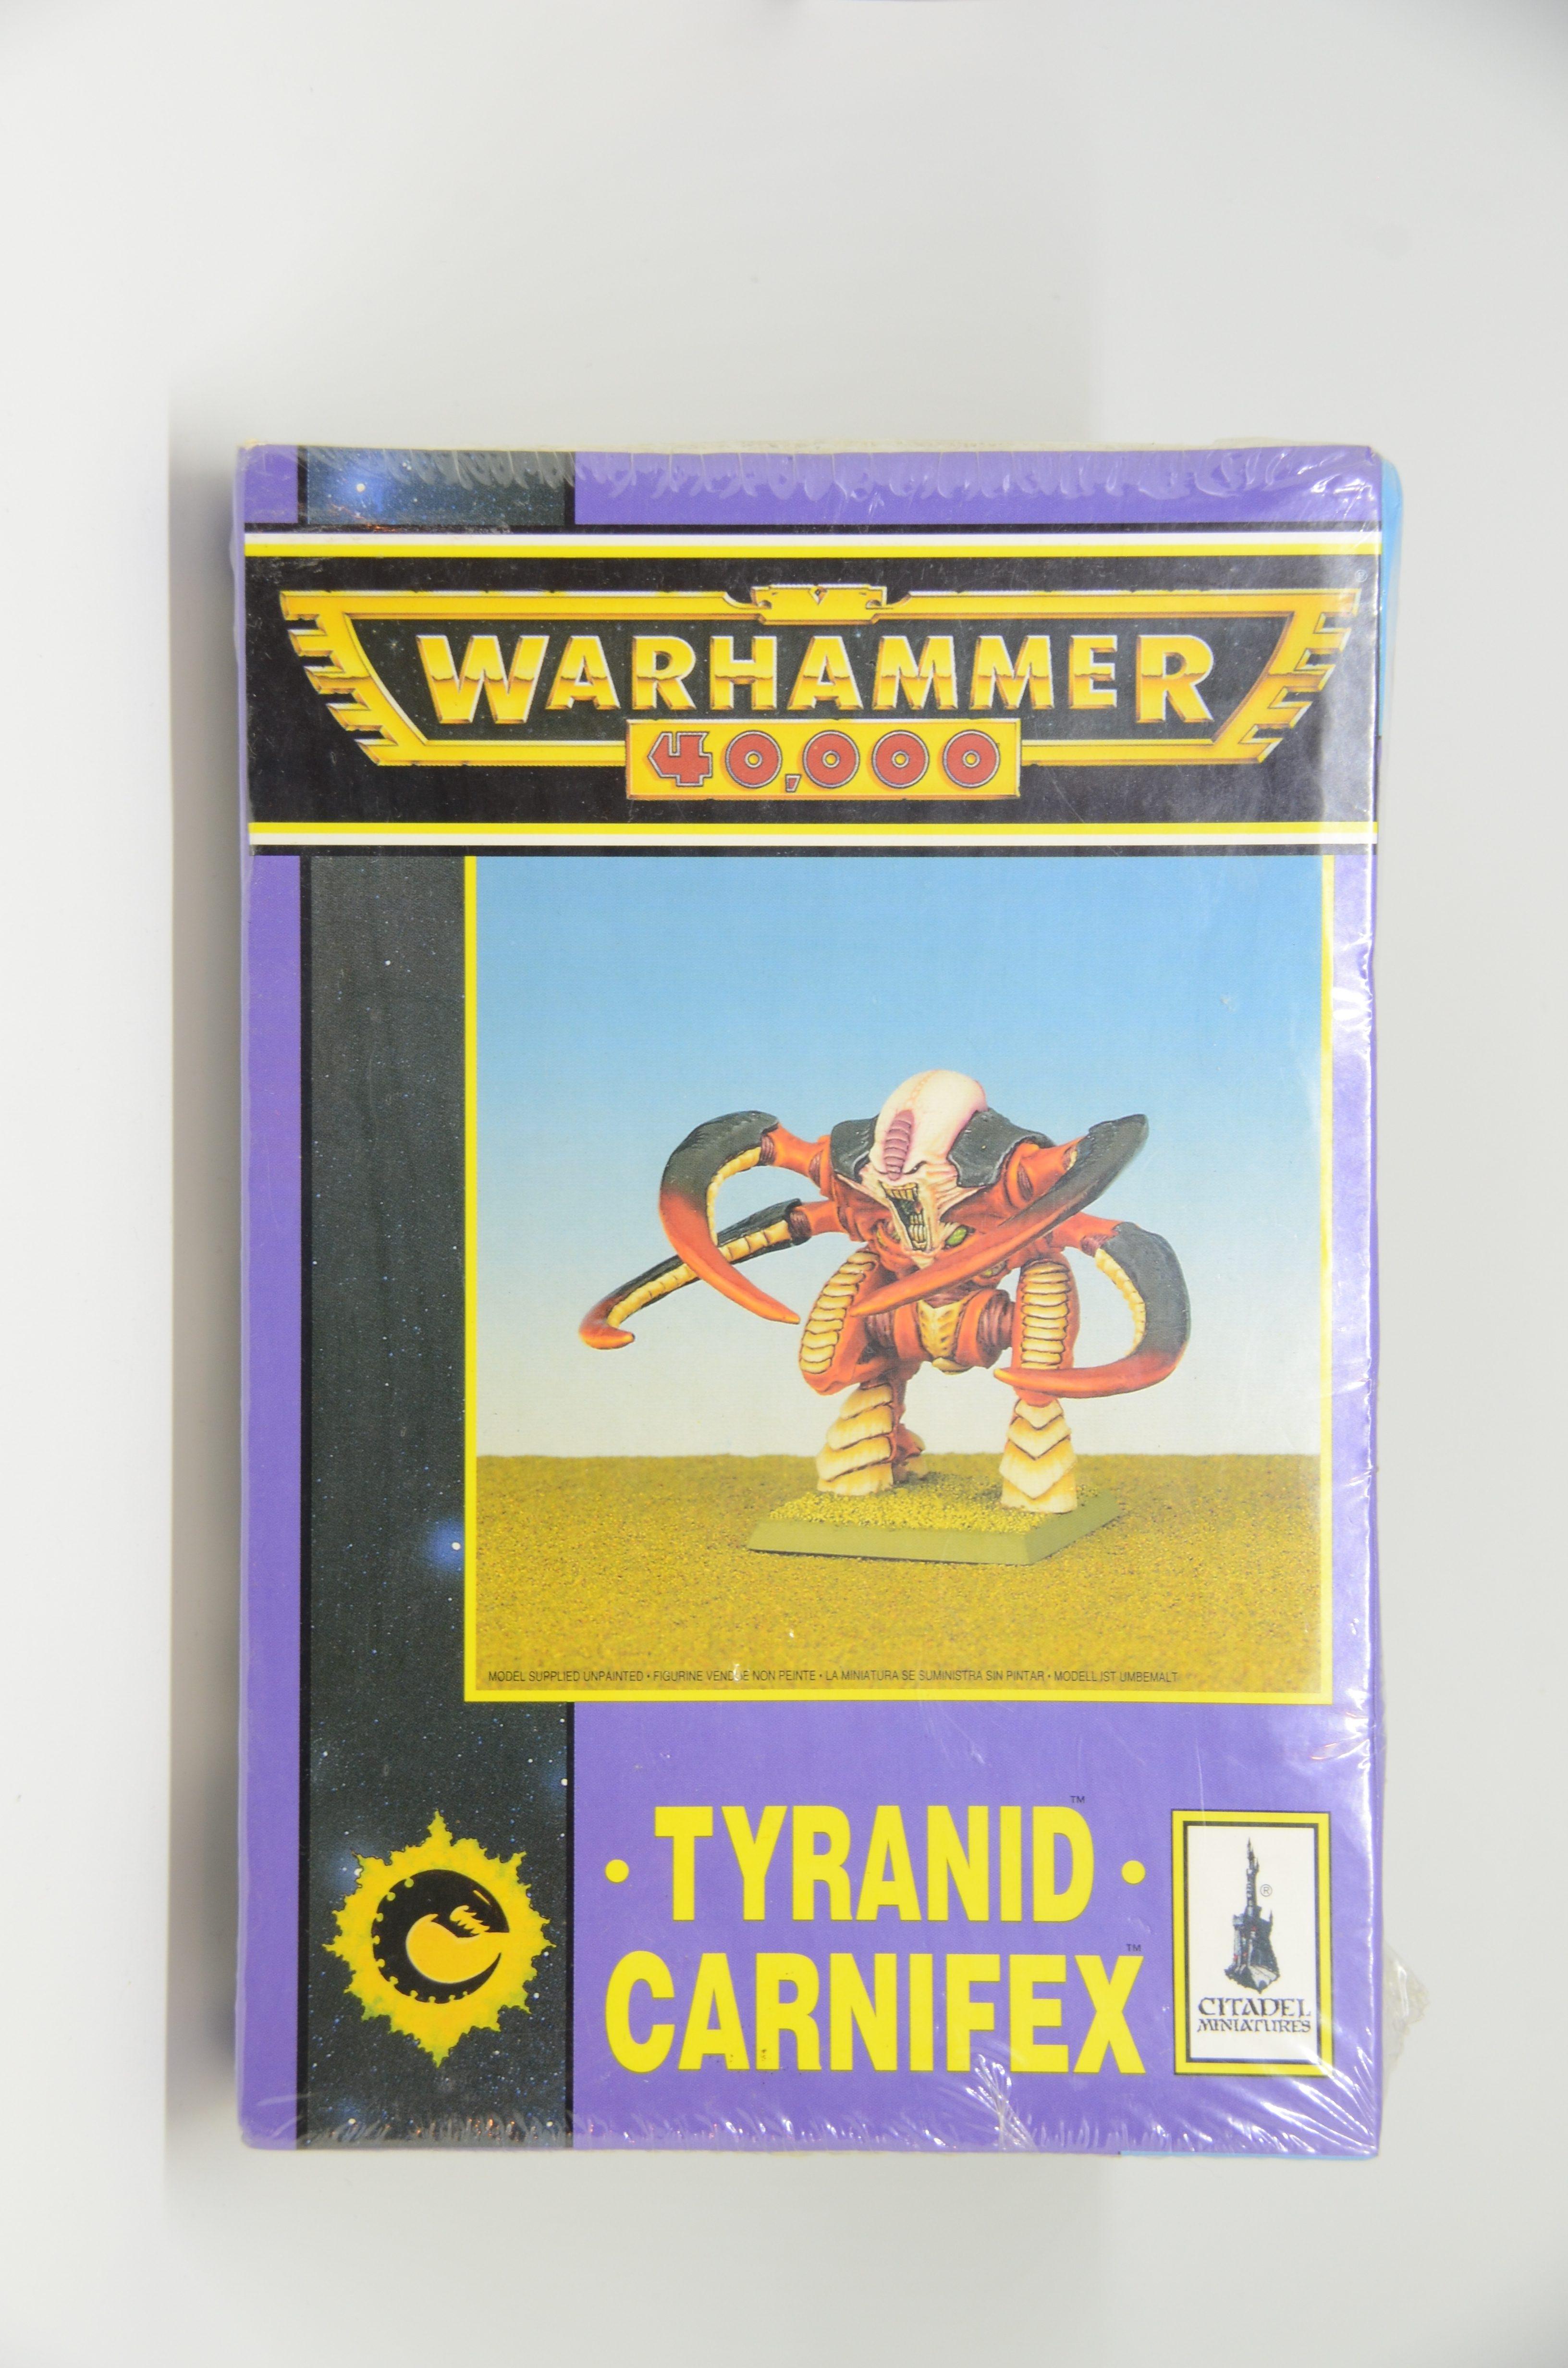 Tyranid Carnifex